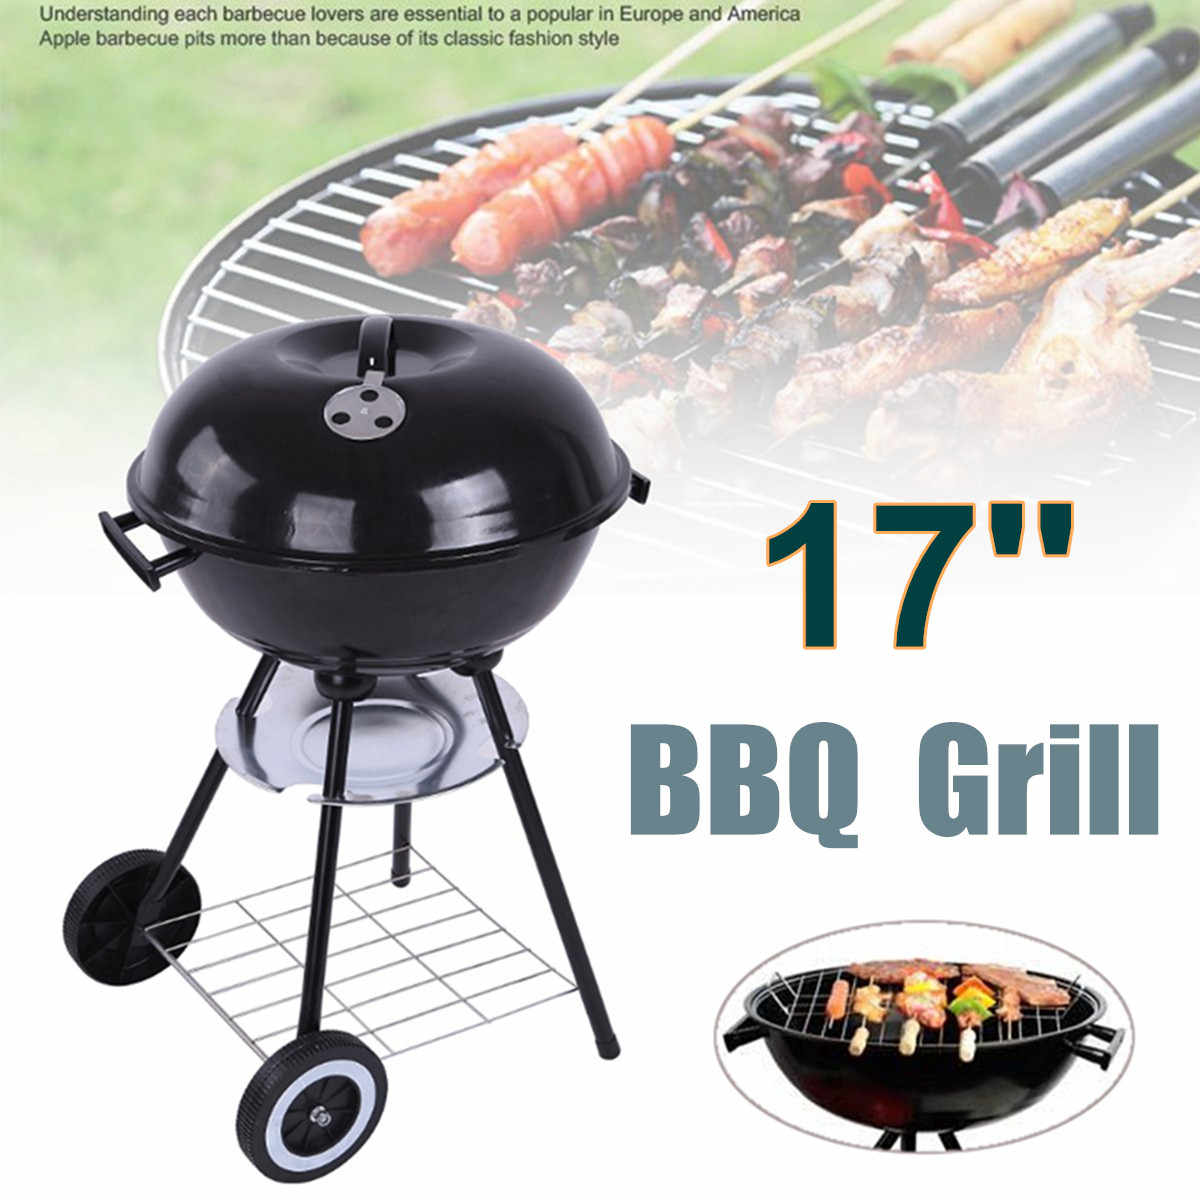 Carrito de 17 ''barbacoa de carbón de Metal parrilla Pit al aire libre Camping cocina de jardín herramientas de barbacoa accesorios de barbacoa herramientas de cocina